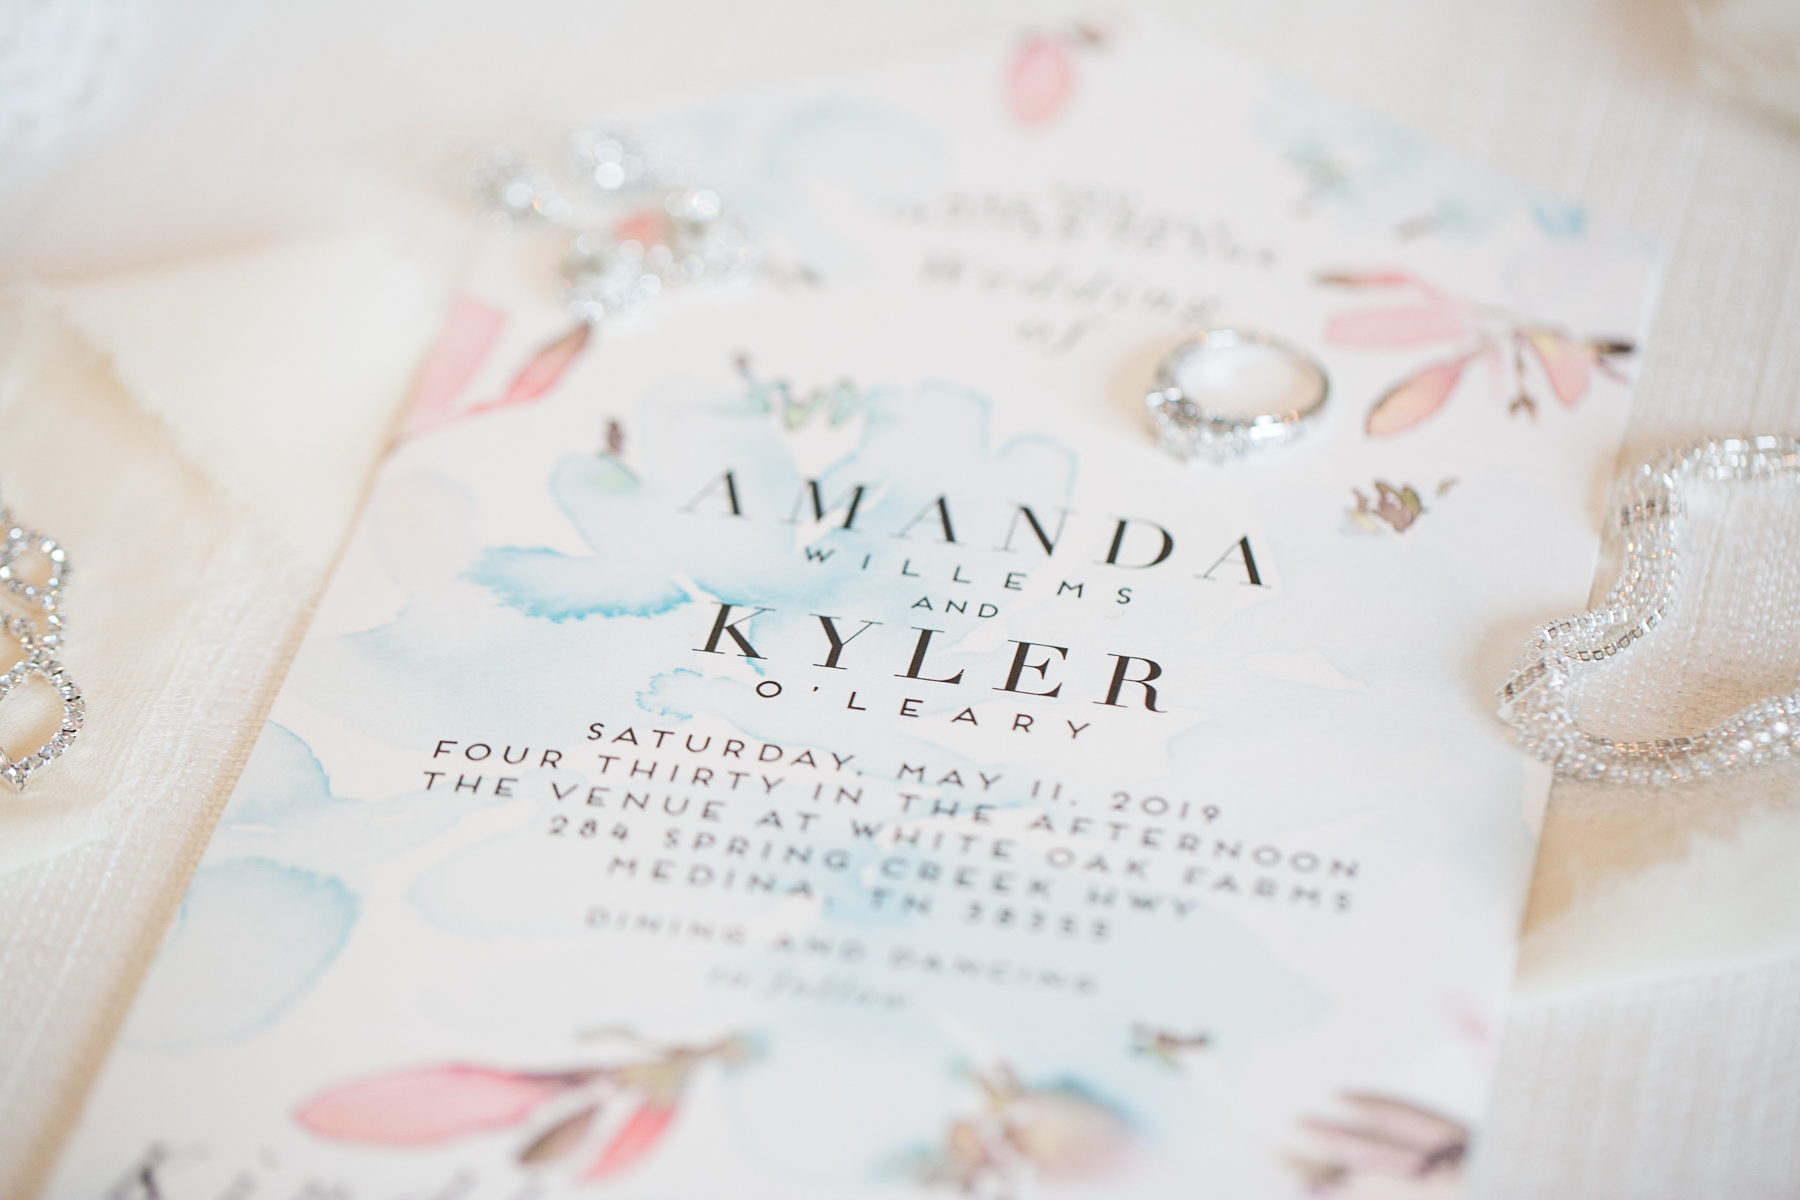 wedding-details-invitation.jpg